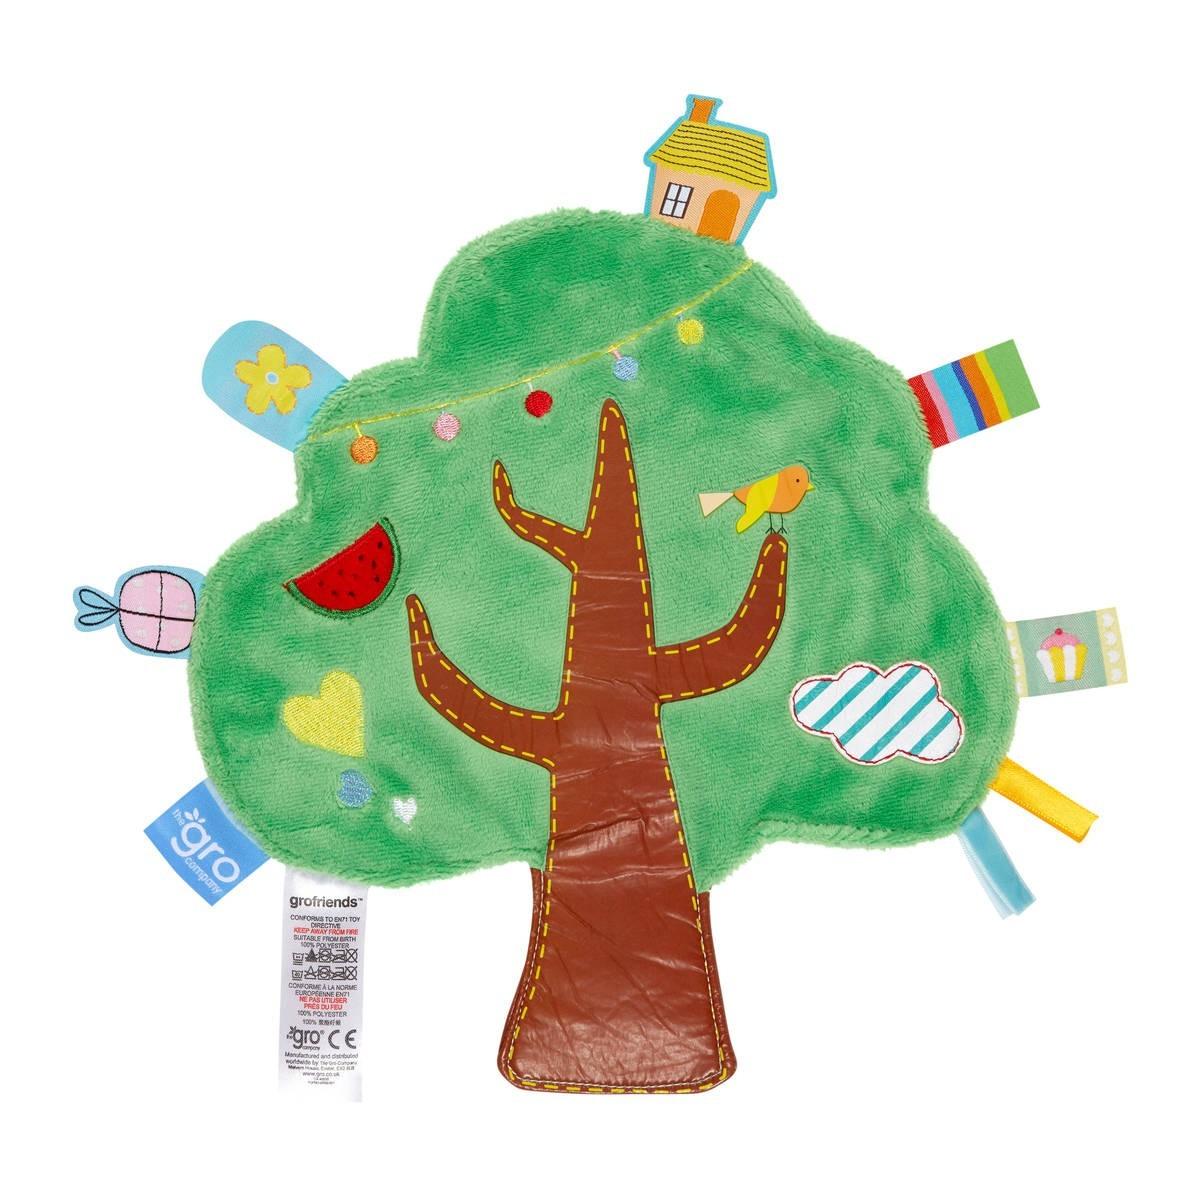 Gro Friend Flat Comforter (Tree House) image